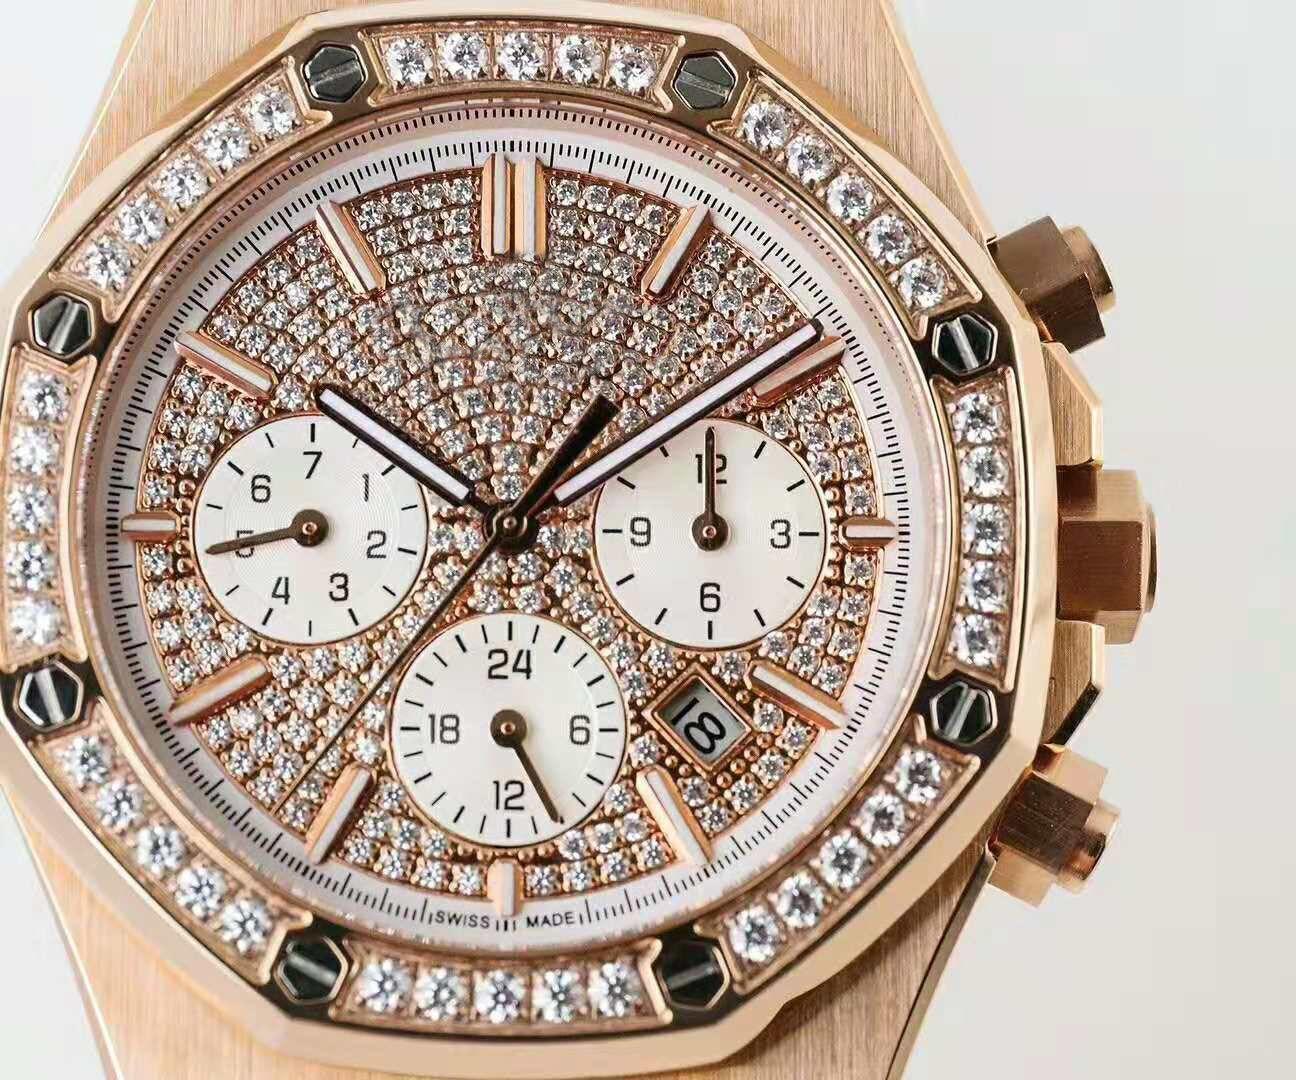 brand orologi lusso 6804743 denisemoscuzza.it